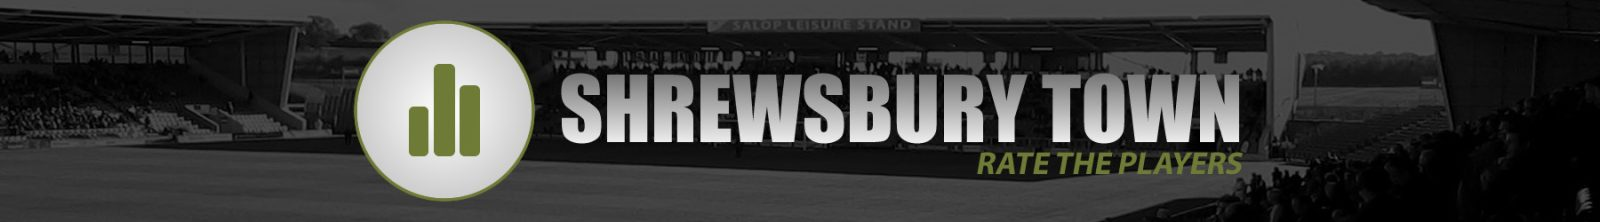 Rate Shrewsbury Town